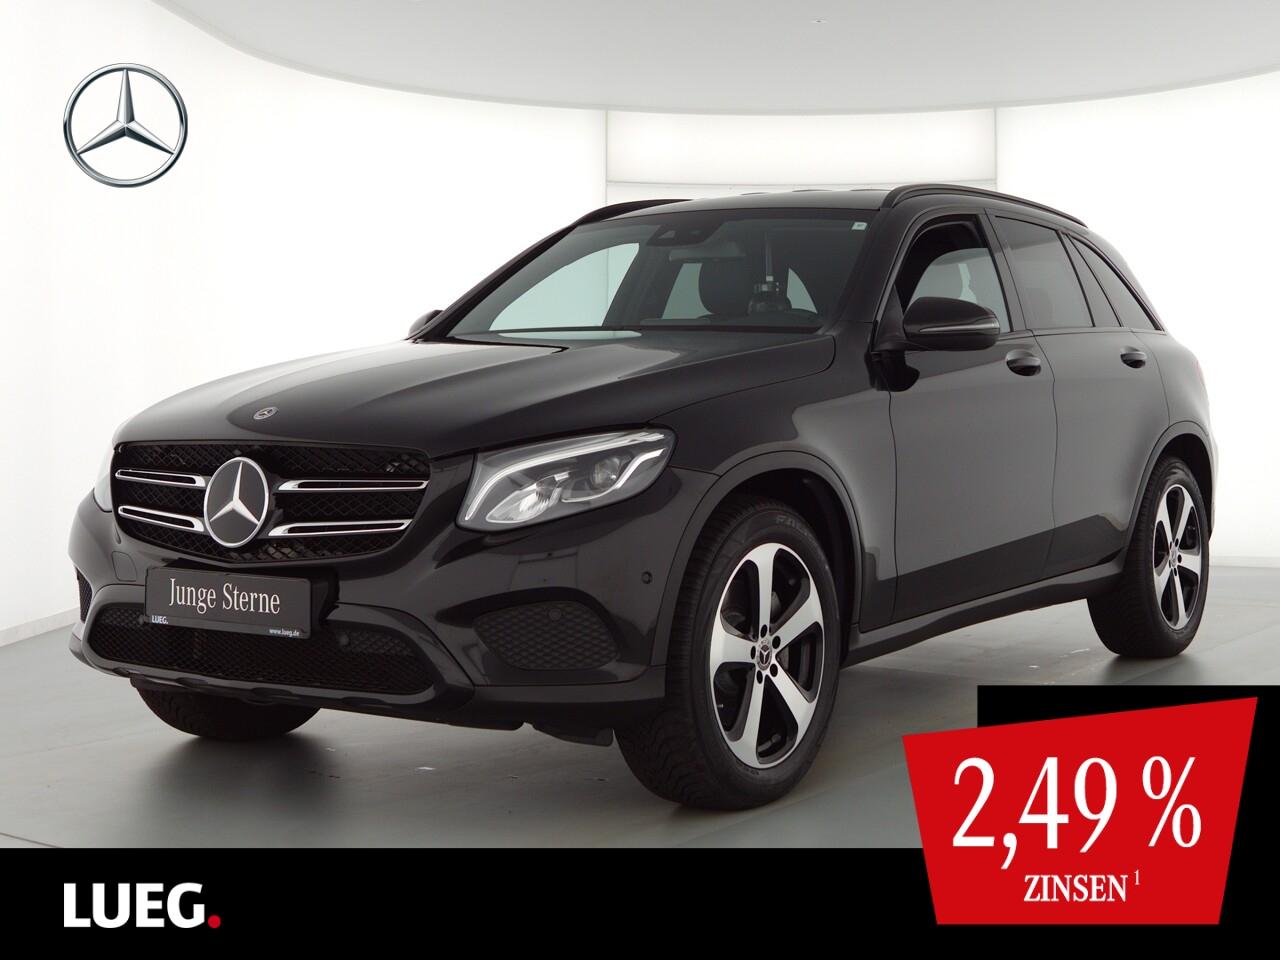 Mercedes-Benz GLC 250 d 4M Exclusive+COM+LED-HP+Distrc+19''+AH, Jahr 2017, Diesel